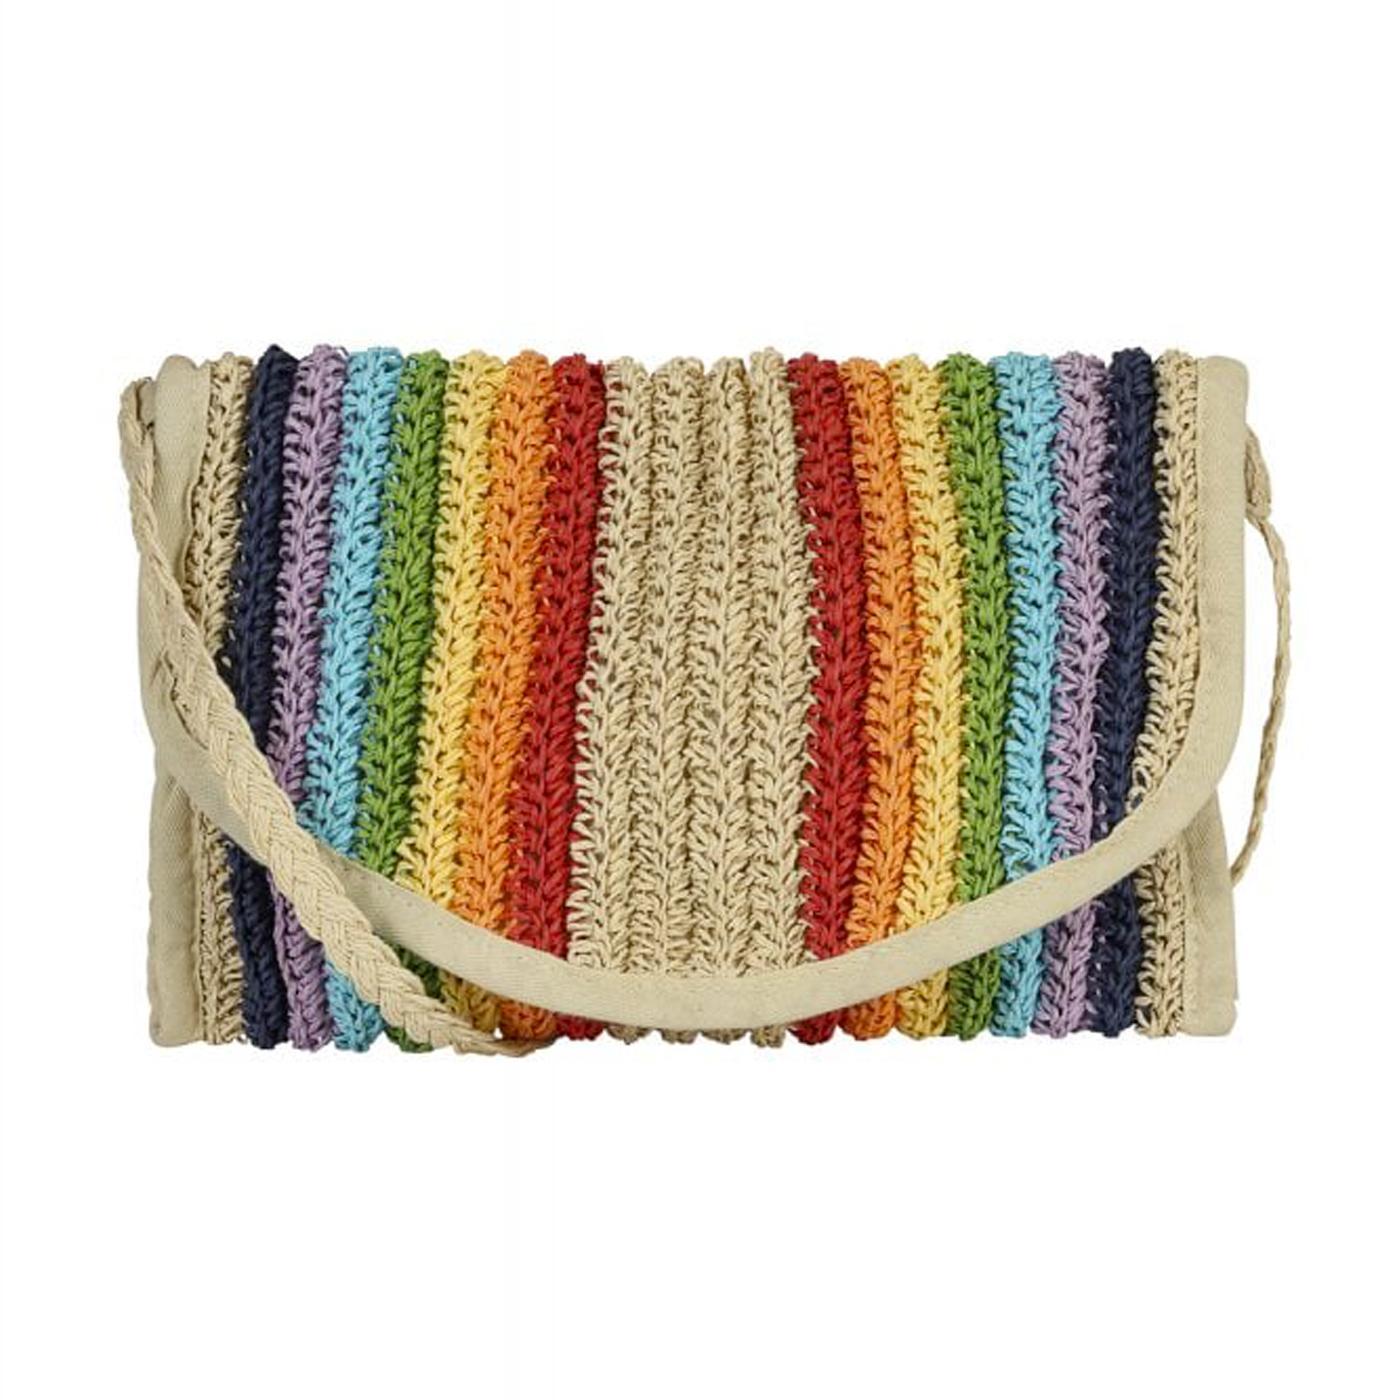 Liza COLLECTIF Vintage Woven Rainbow Summer Bag